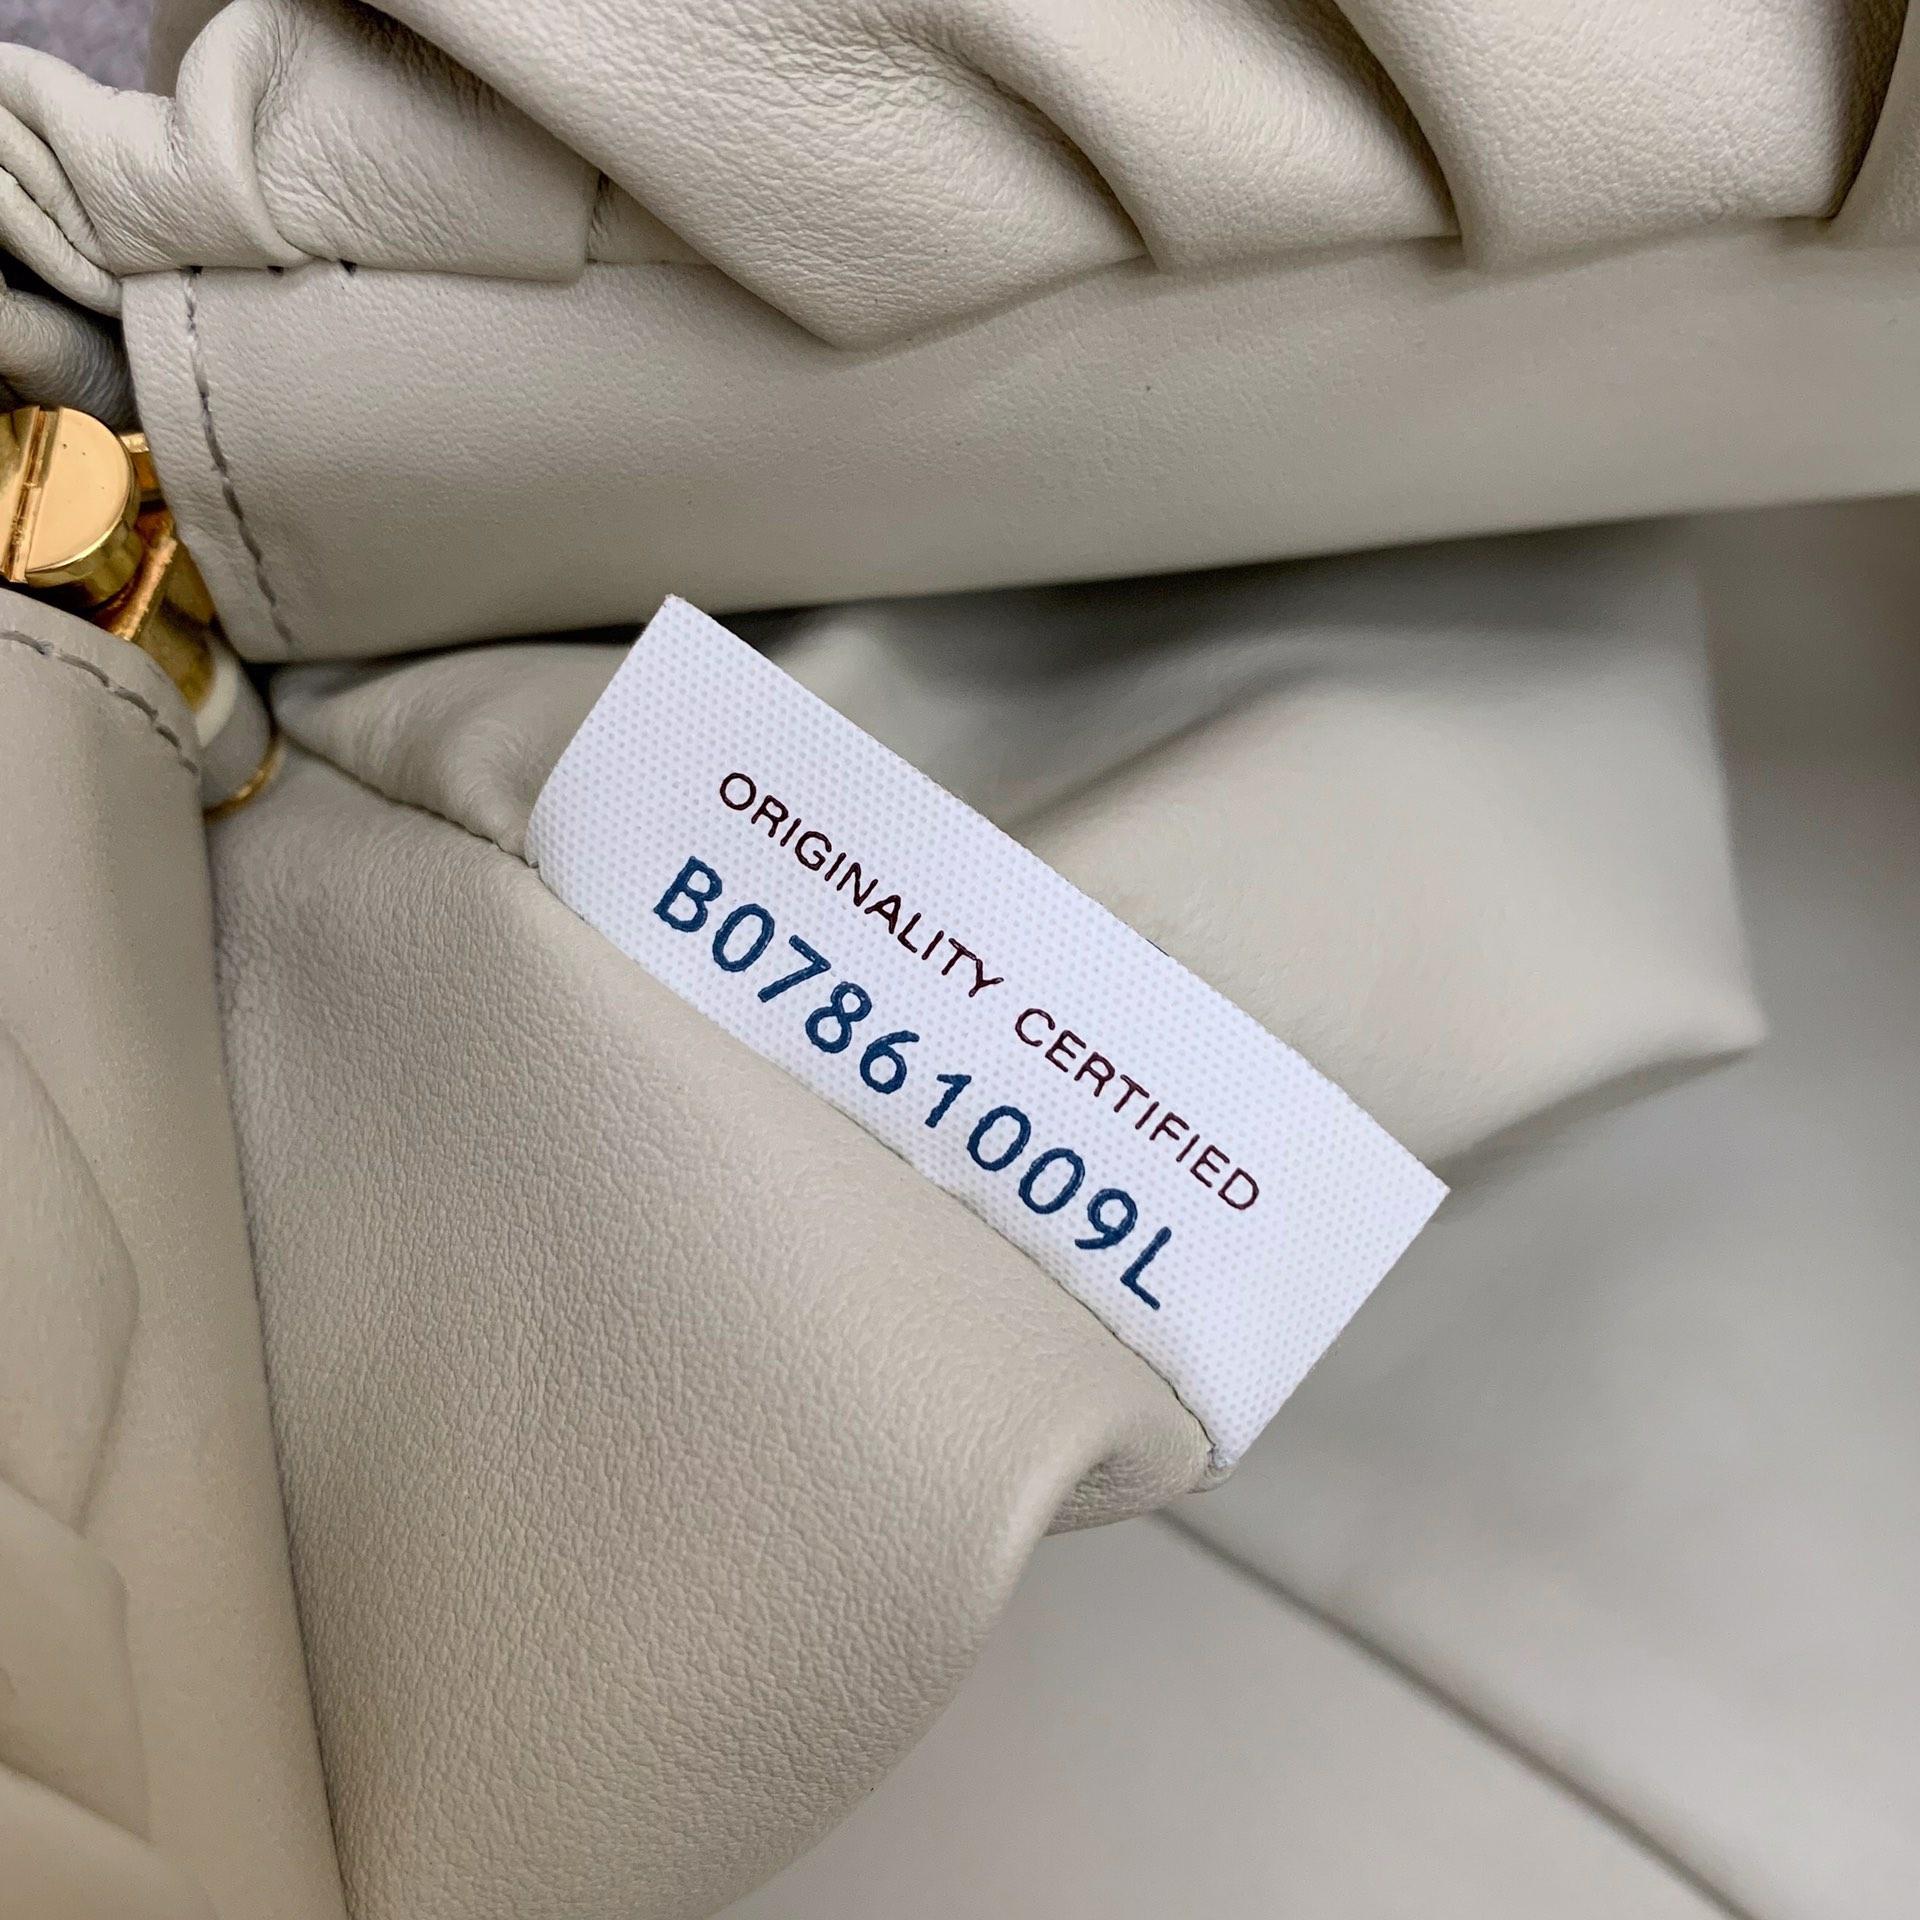 BottegaVeneta 大金链条配色云朵包 620230白色 31-12-6